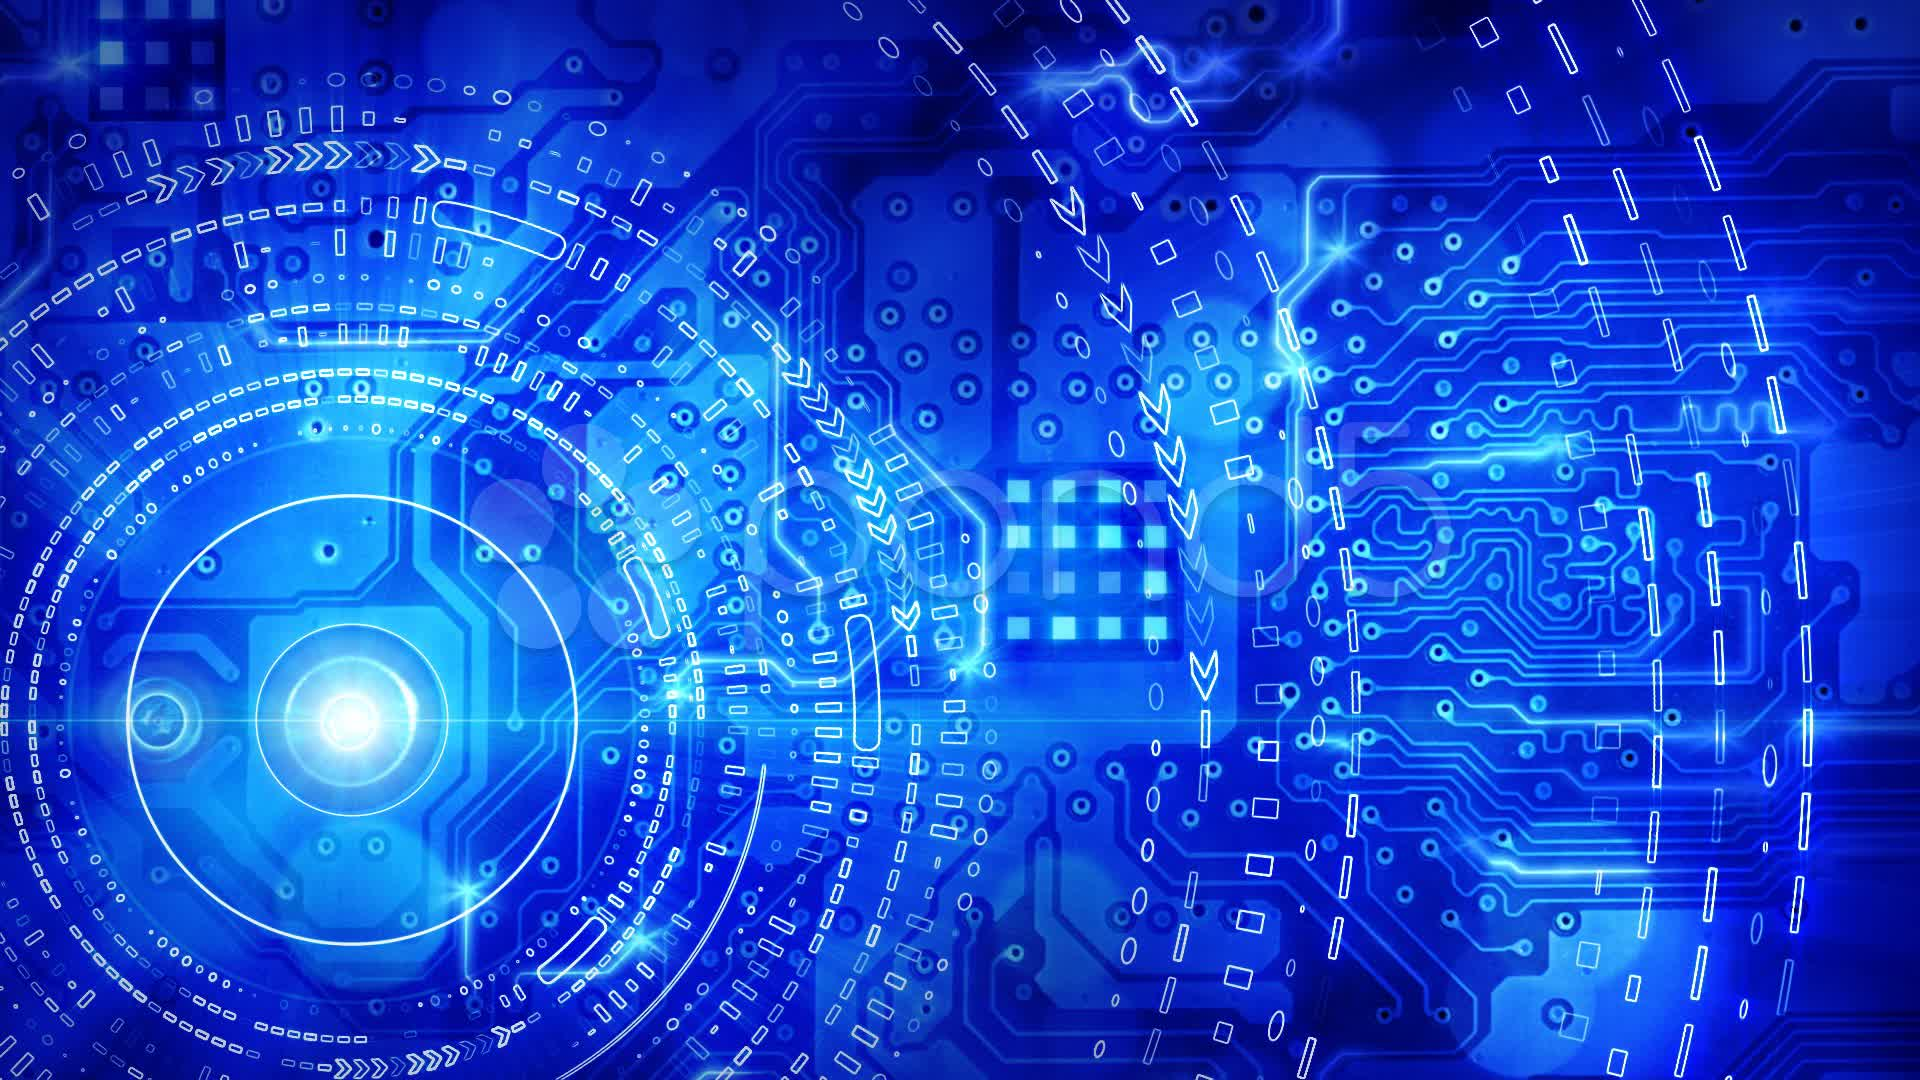 Blue Computer Circuit Board Background Loop Stock Video 10686486 HD 1920x1080